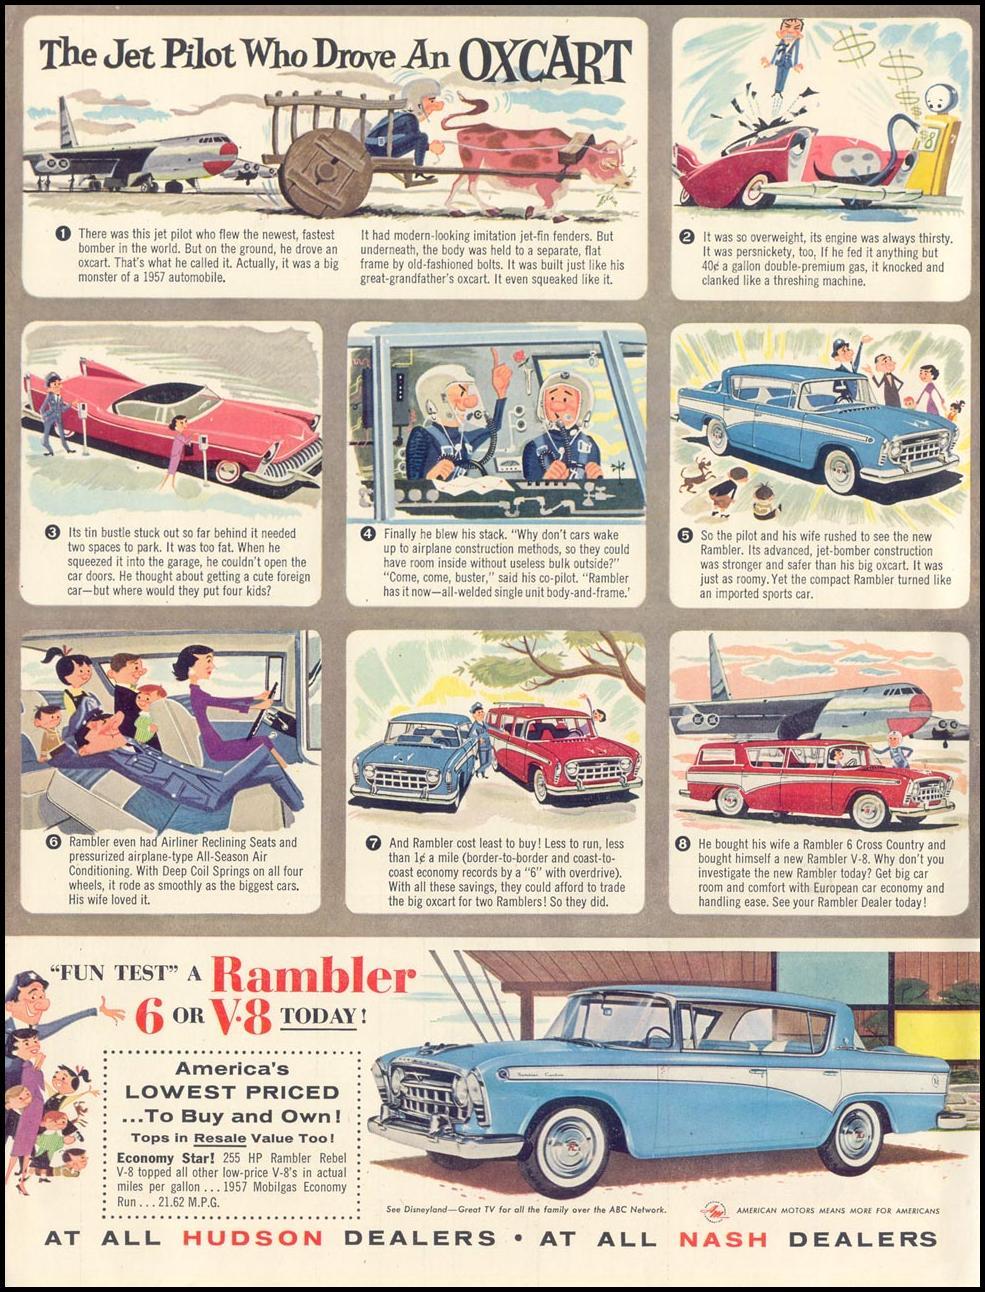 RAMBLER AUTOMOBILES LIFE 07/01/1957 INSIDE FRONT